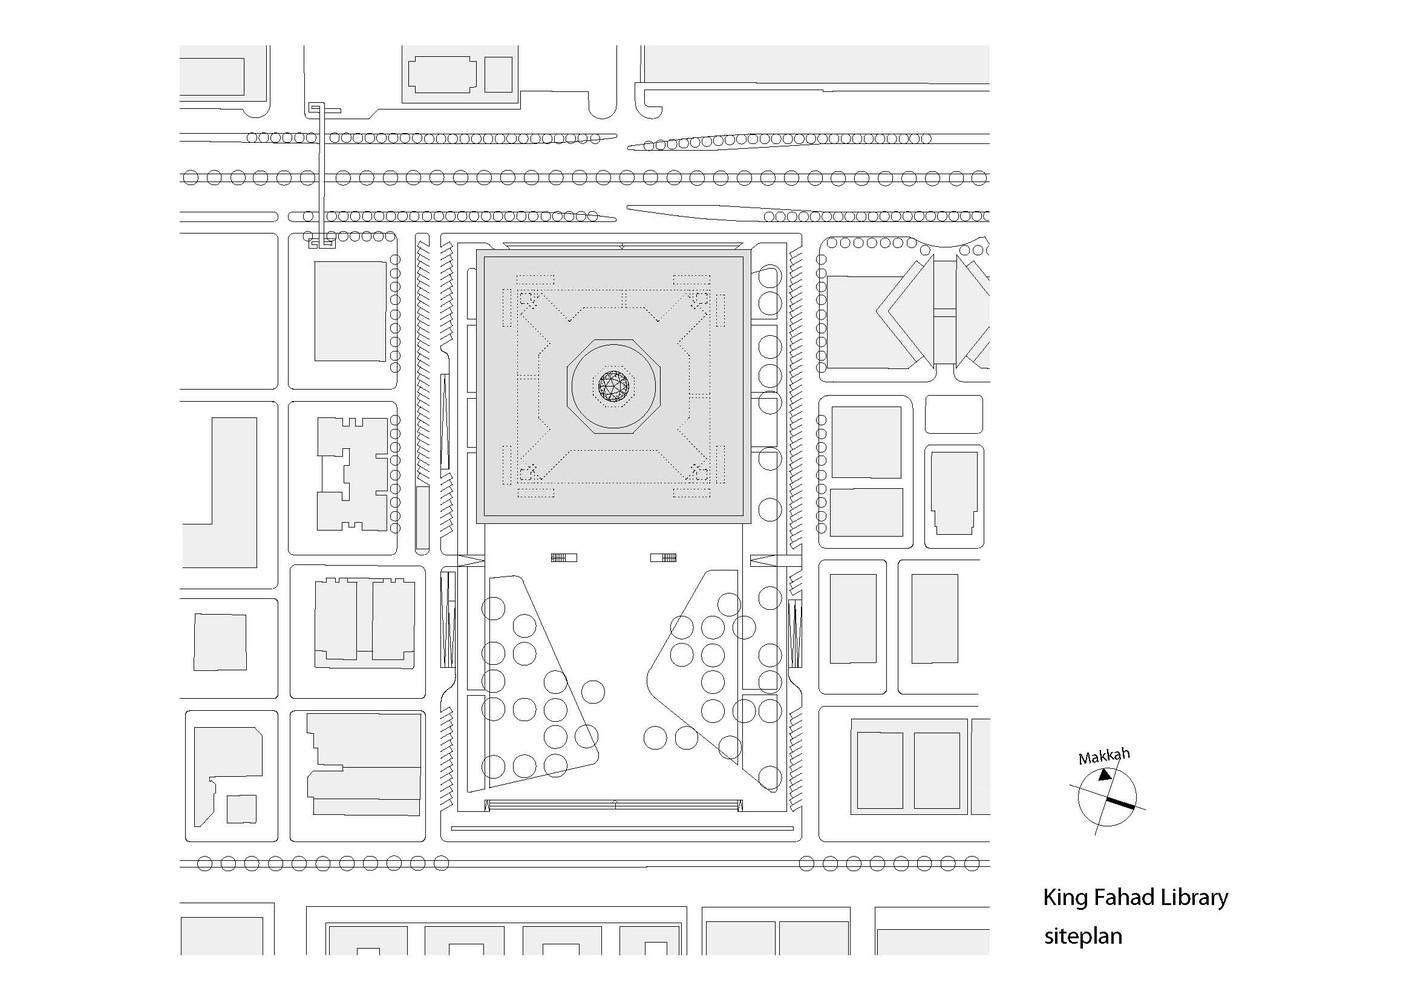 1965 impala 2 speed wiper motor wiring king fahad national library floor plan [ 1415 x 1000 Pixel ]